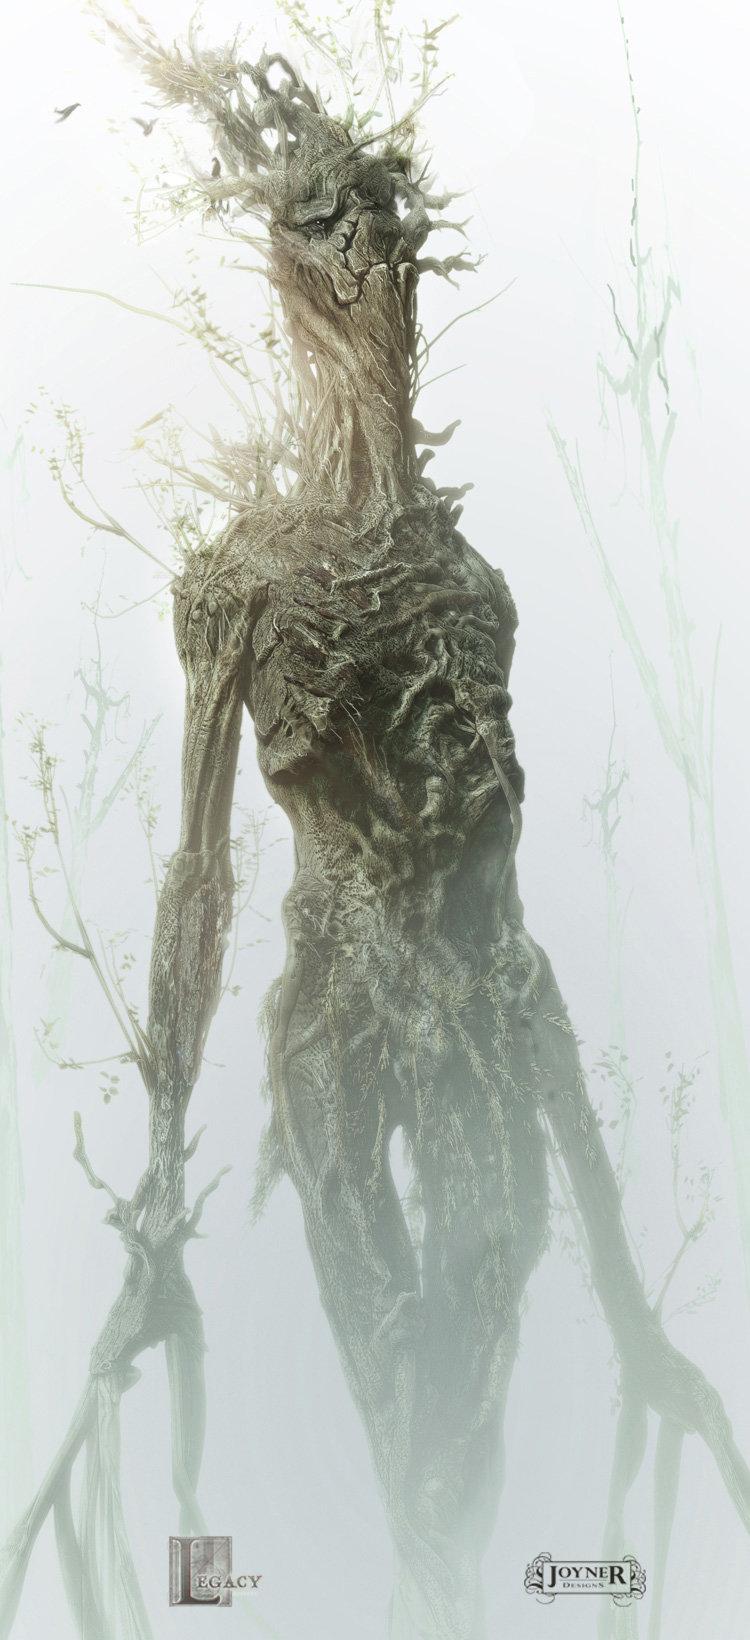 Ian joyner treemin 1